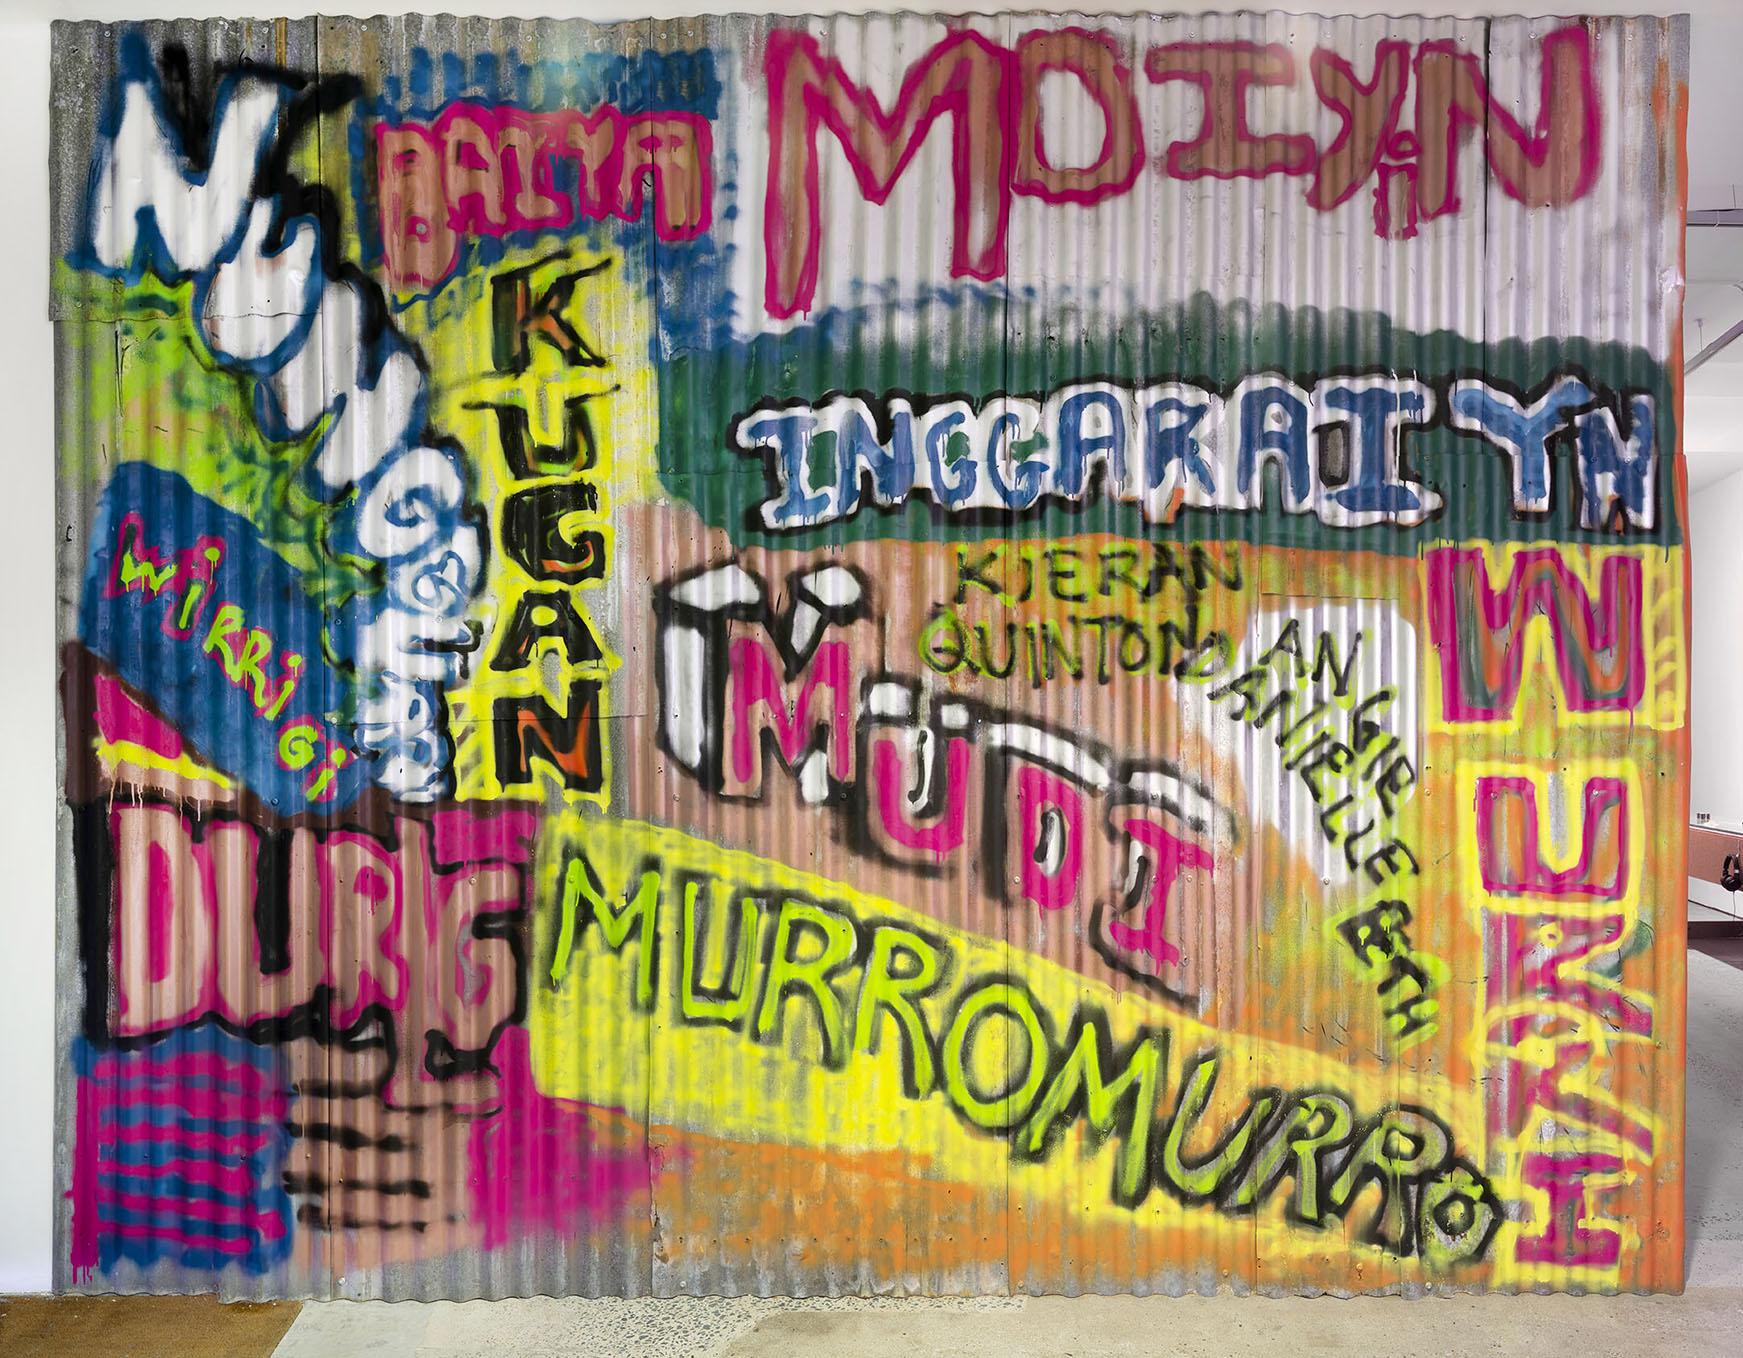 Karrabing Film Collective_Graffitti Dreaming_2018_Corrugated iron spray paint_Photo_Carl Warner_1